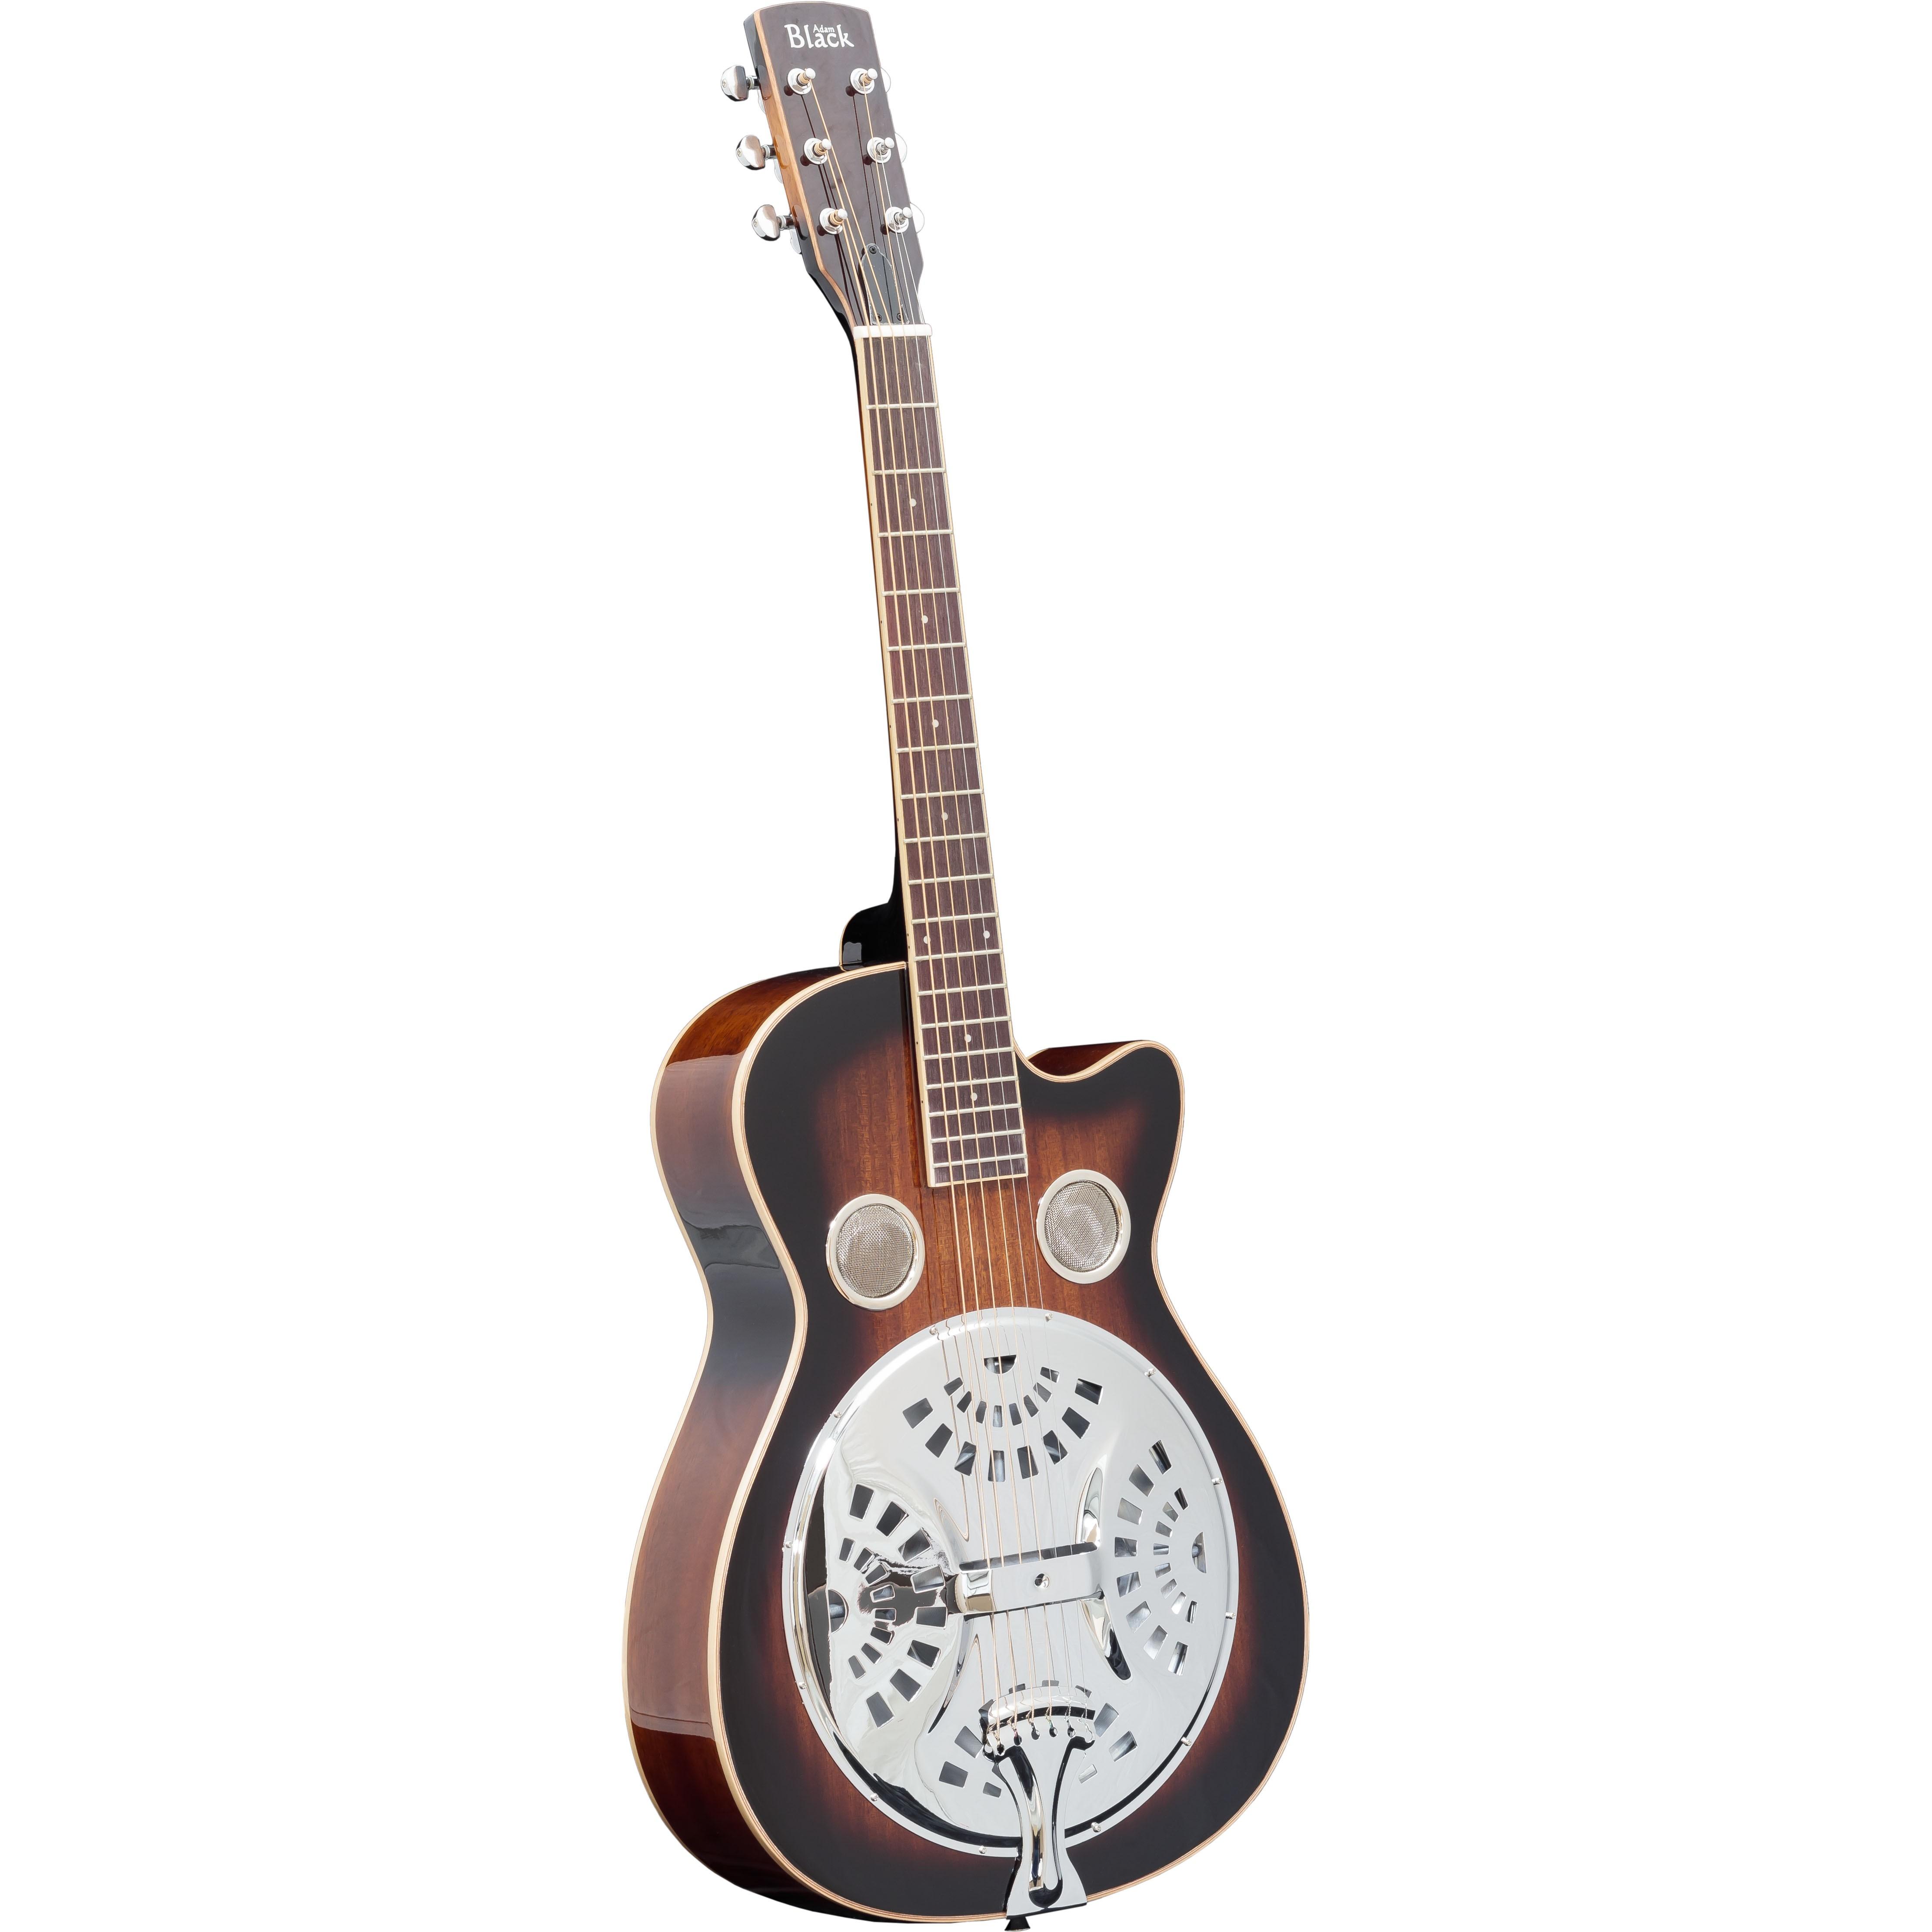 Adam Black R-02 Resonator Guitar with Gigbag - Vintage Sunburst